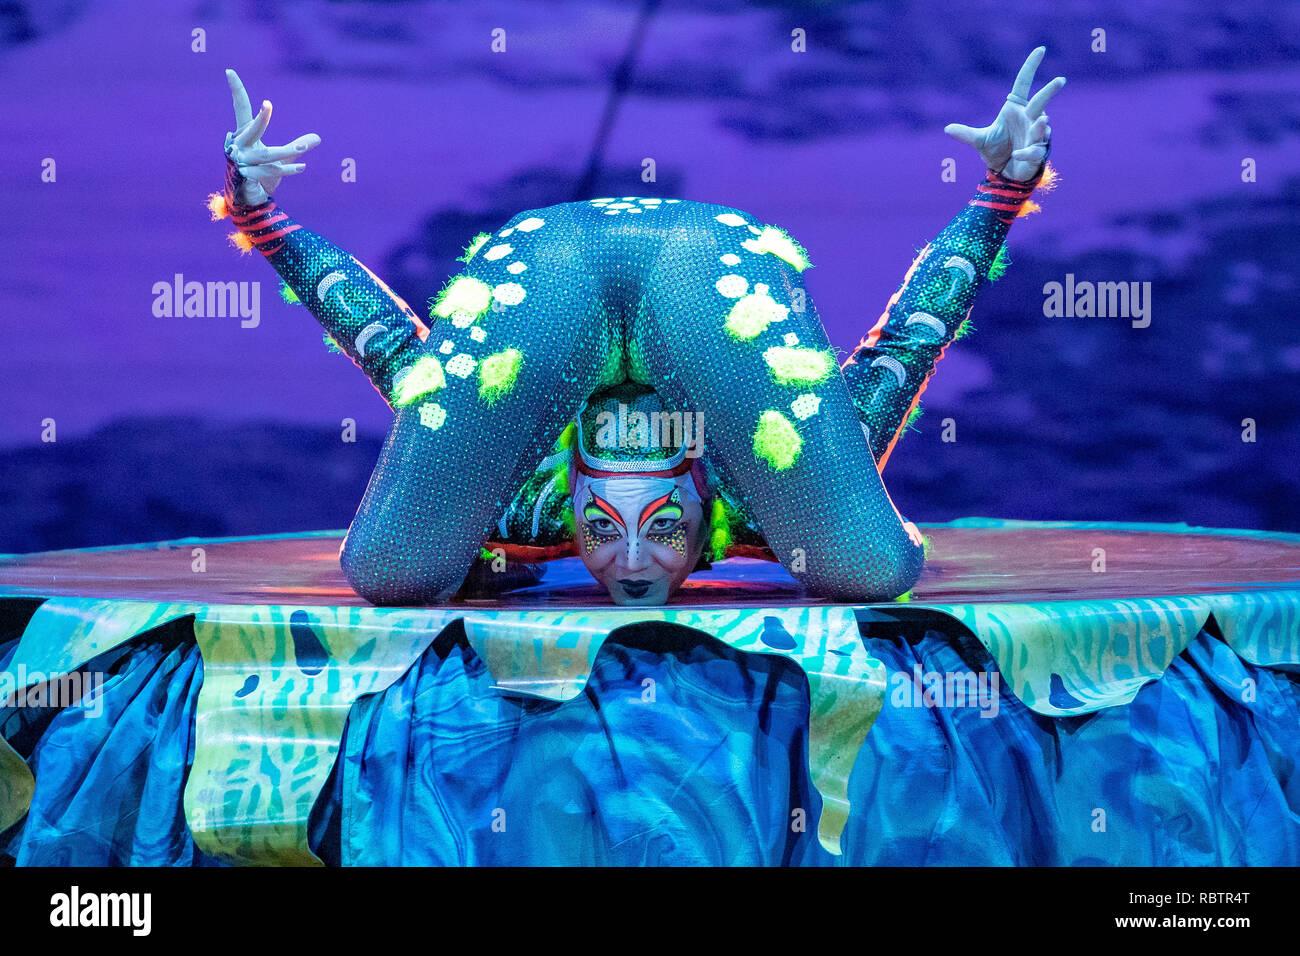 "Londra, Inghilterra. Xi Gennaio 201, membri del cast del Cirque Du Soleil eseguire in ""Cirque Du Soleil Totem' Prove abito presso la Royal Albert Hall ,l'Inghilterra, © Jason Richardson / Alamy Live News Immagini Stock"